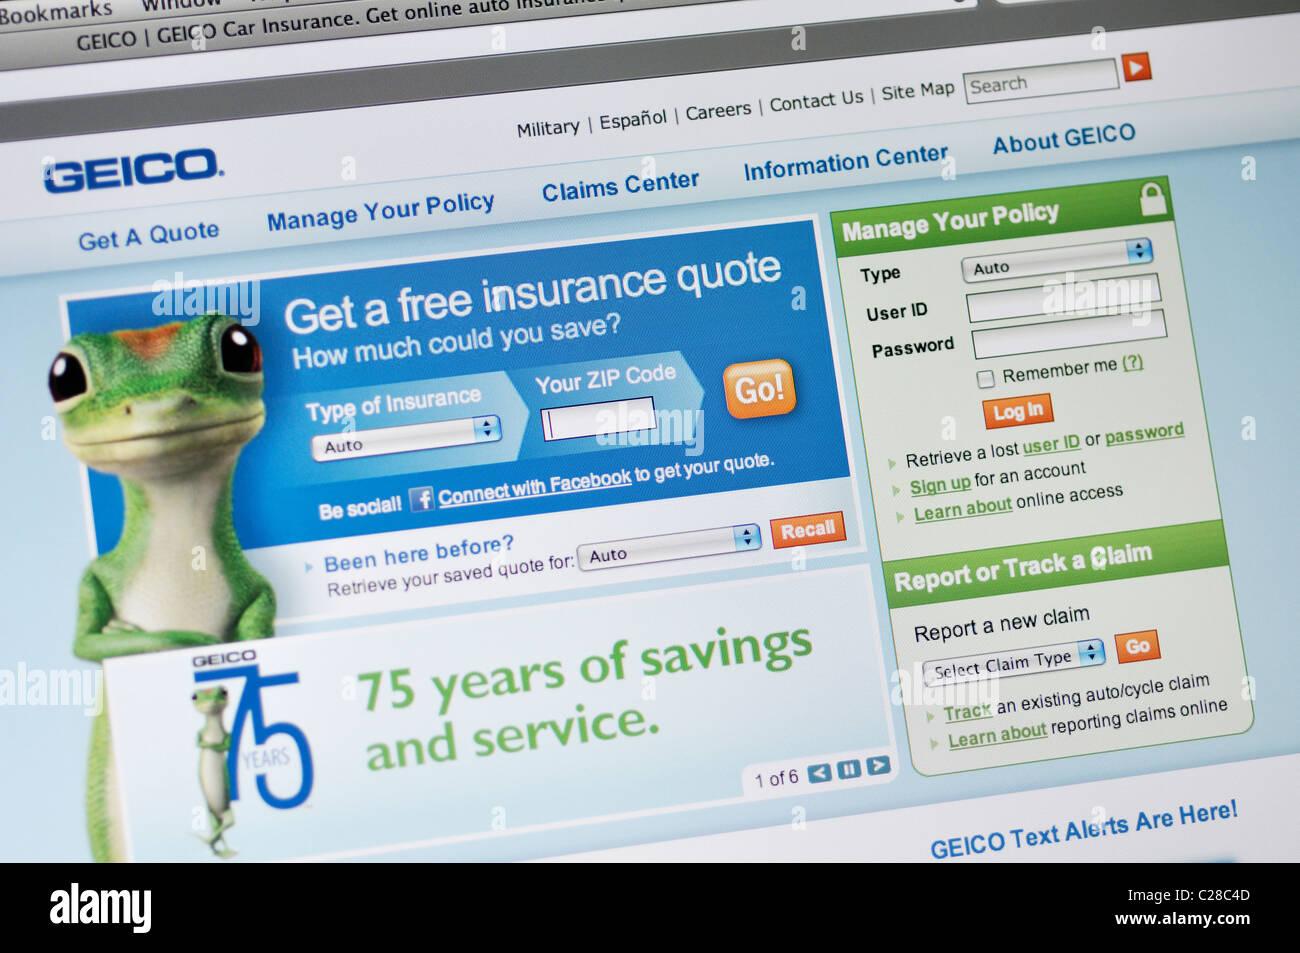 Geico Online Quote | Geico Car Insurance Website Stock Photo 35835197 Alamy